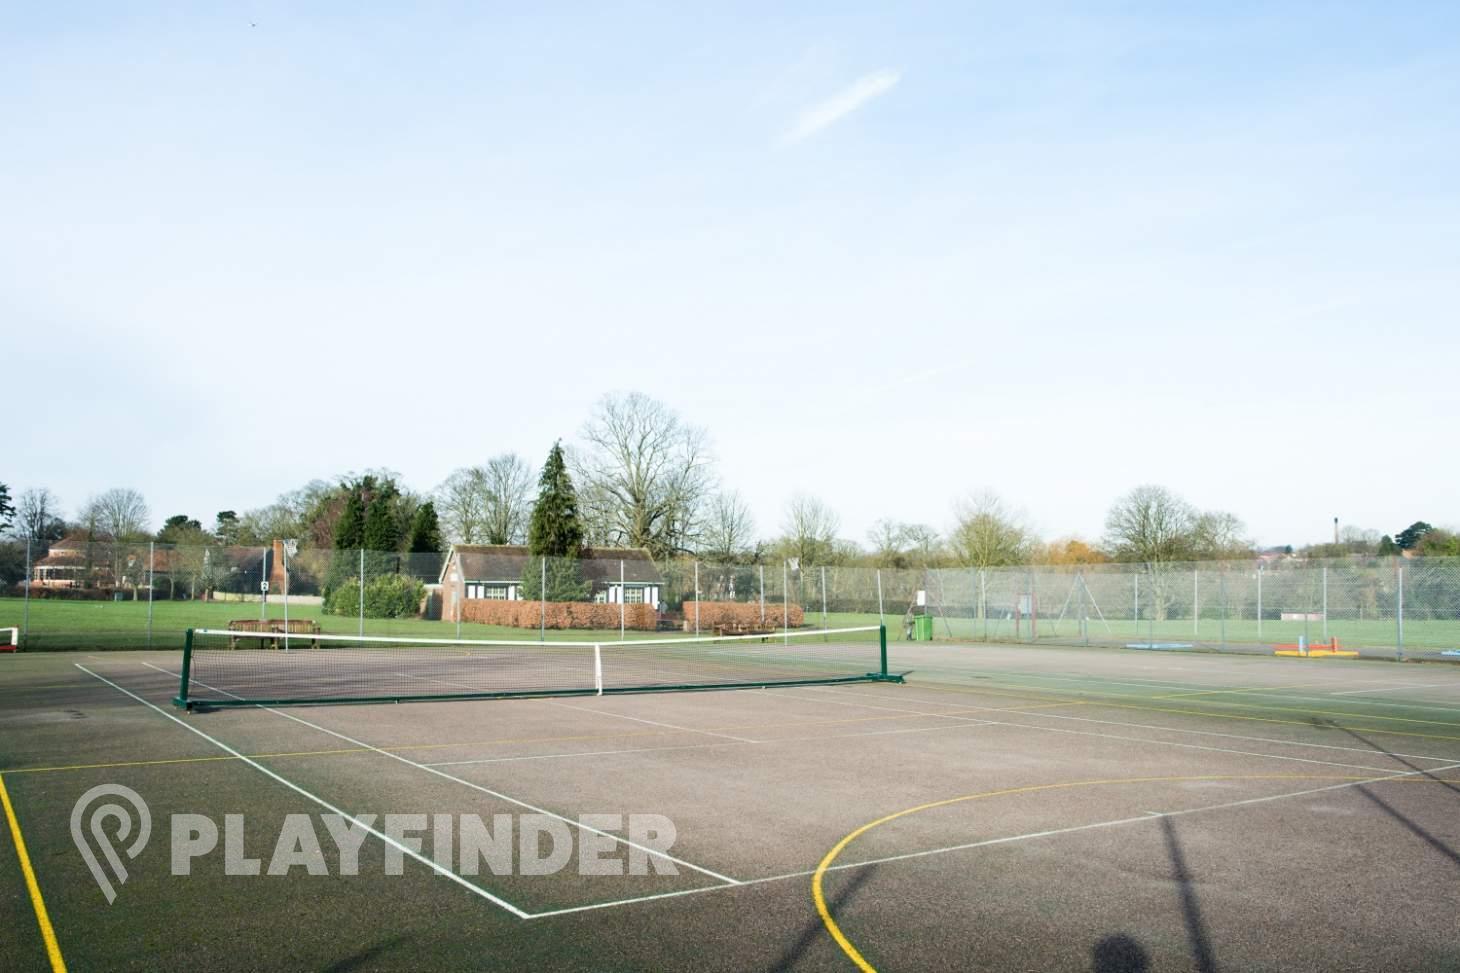 Abbey View Golf Course Outdoor   Hard (macadam) basketball court